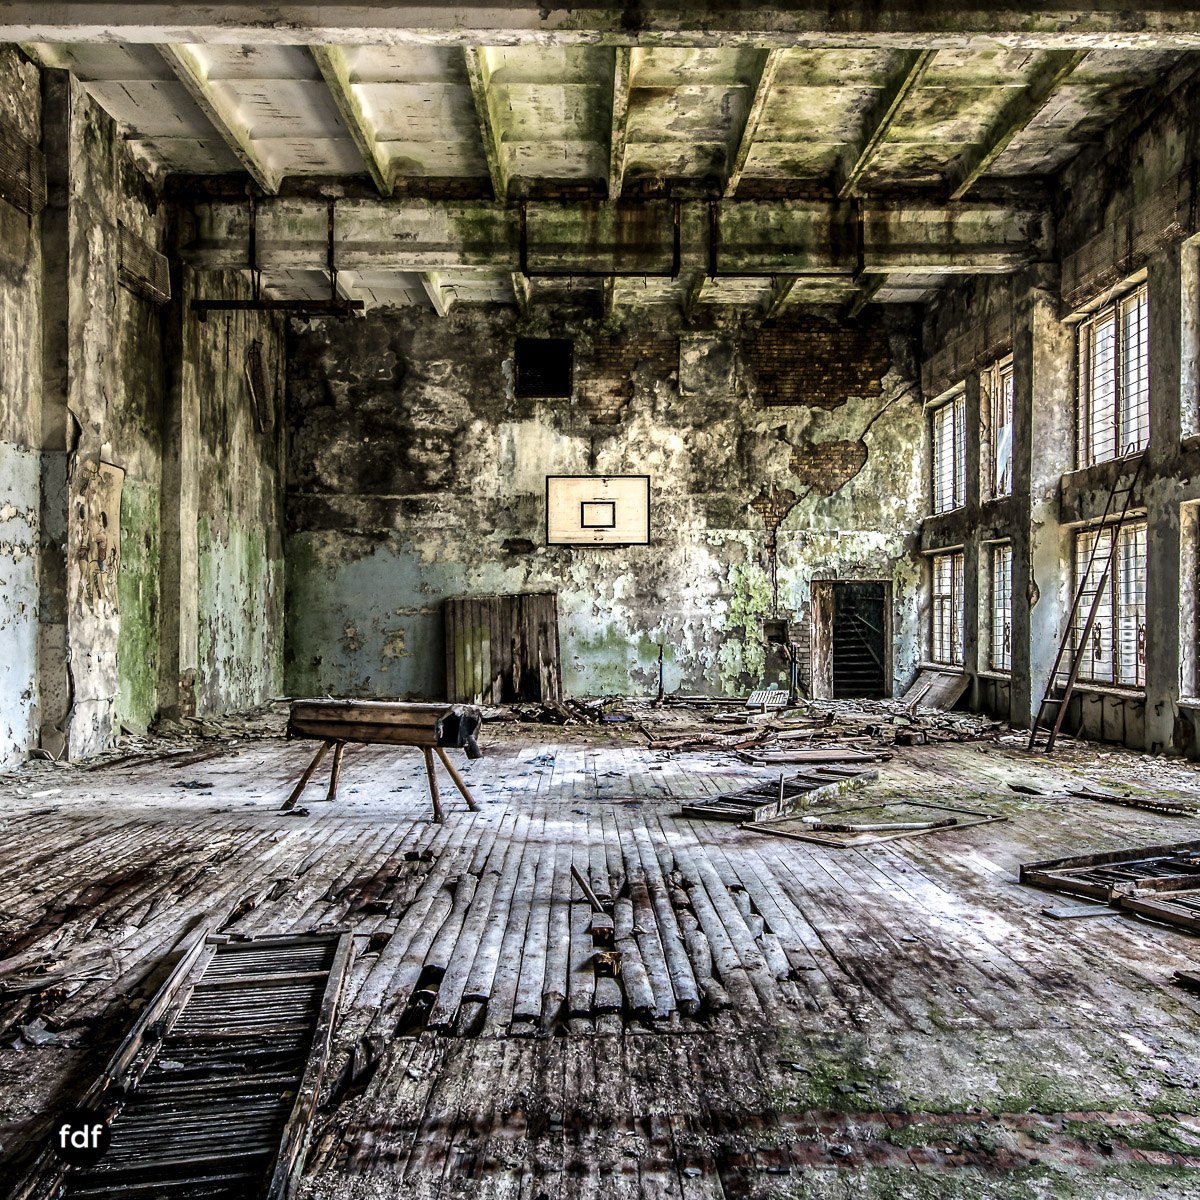 Tschernobyl-Chernobyl-Prypjat-Urbex-Lost-Place-Duga-Schule-Kino-27.jpg